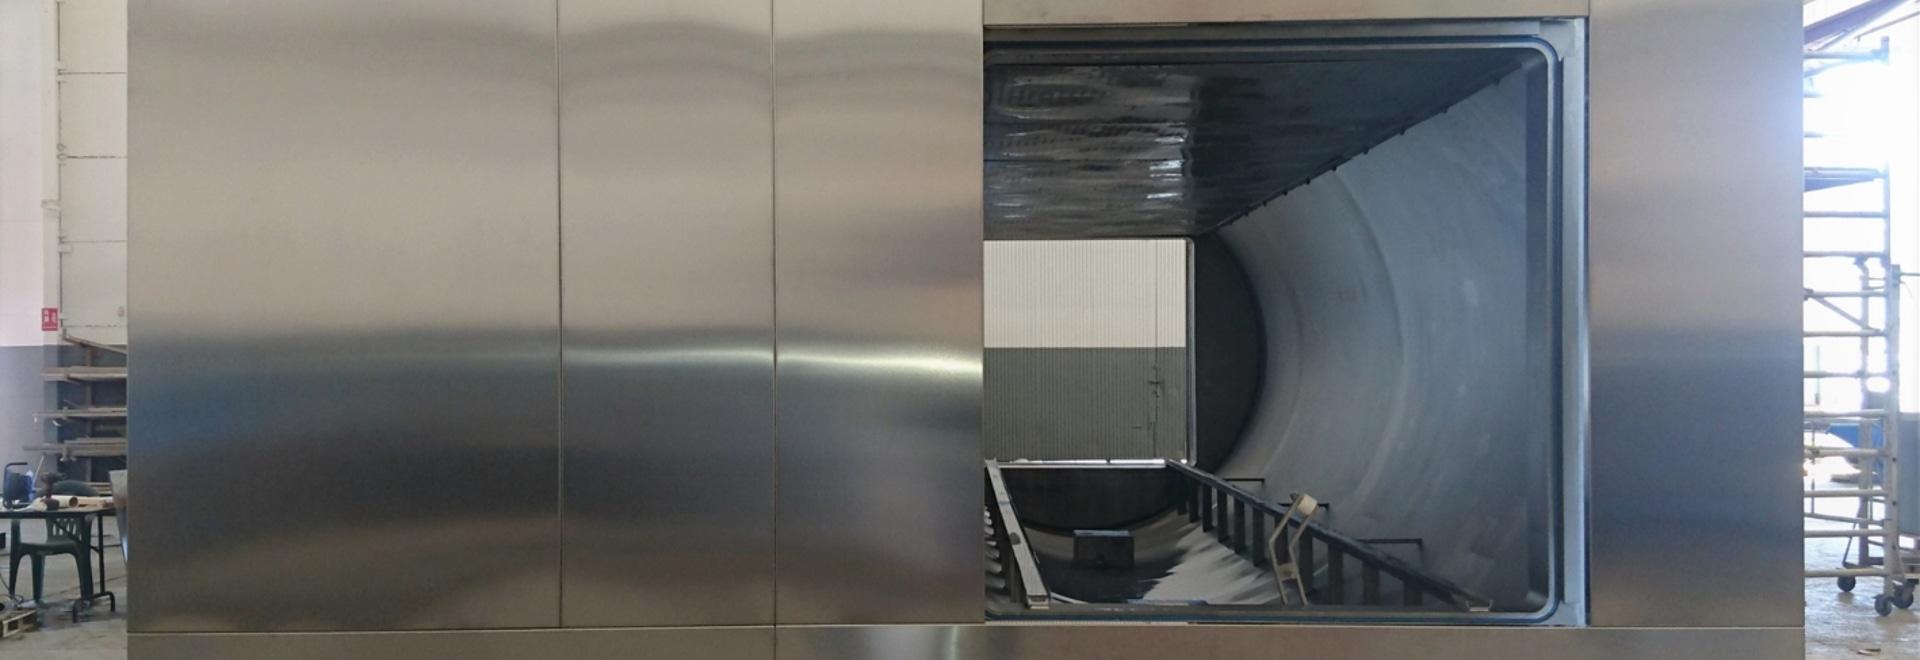 Superheated Water Sterilizer by Inoxtorres